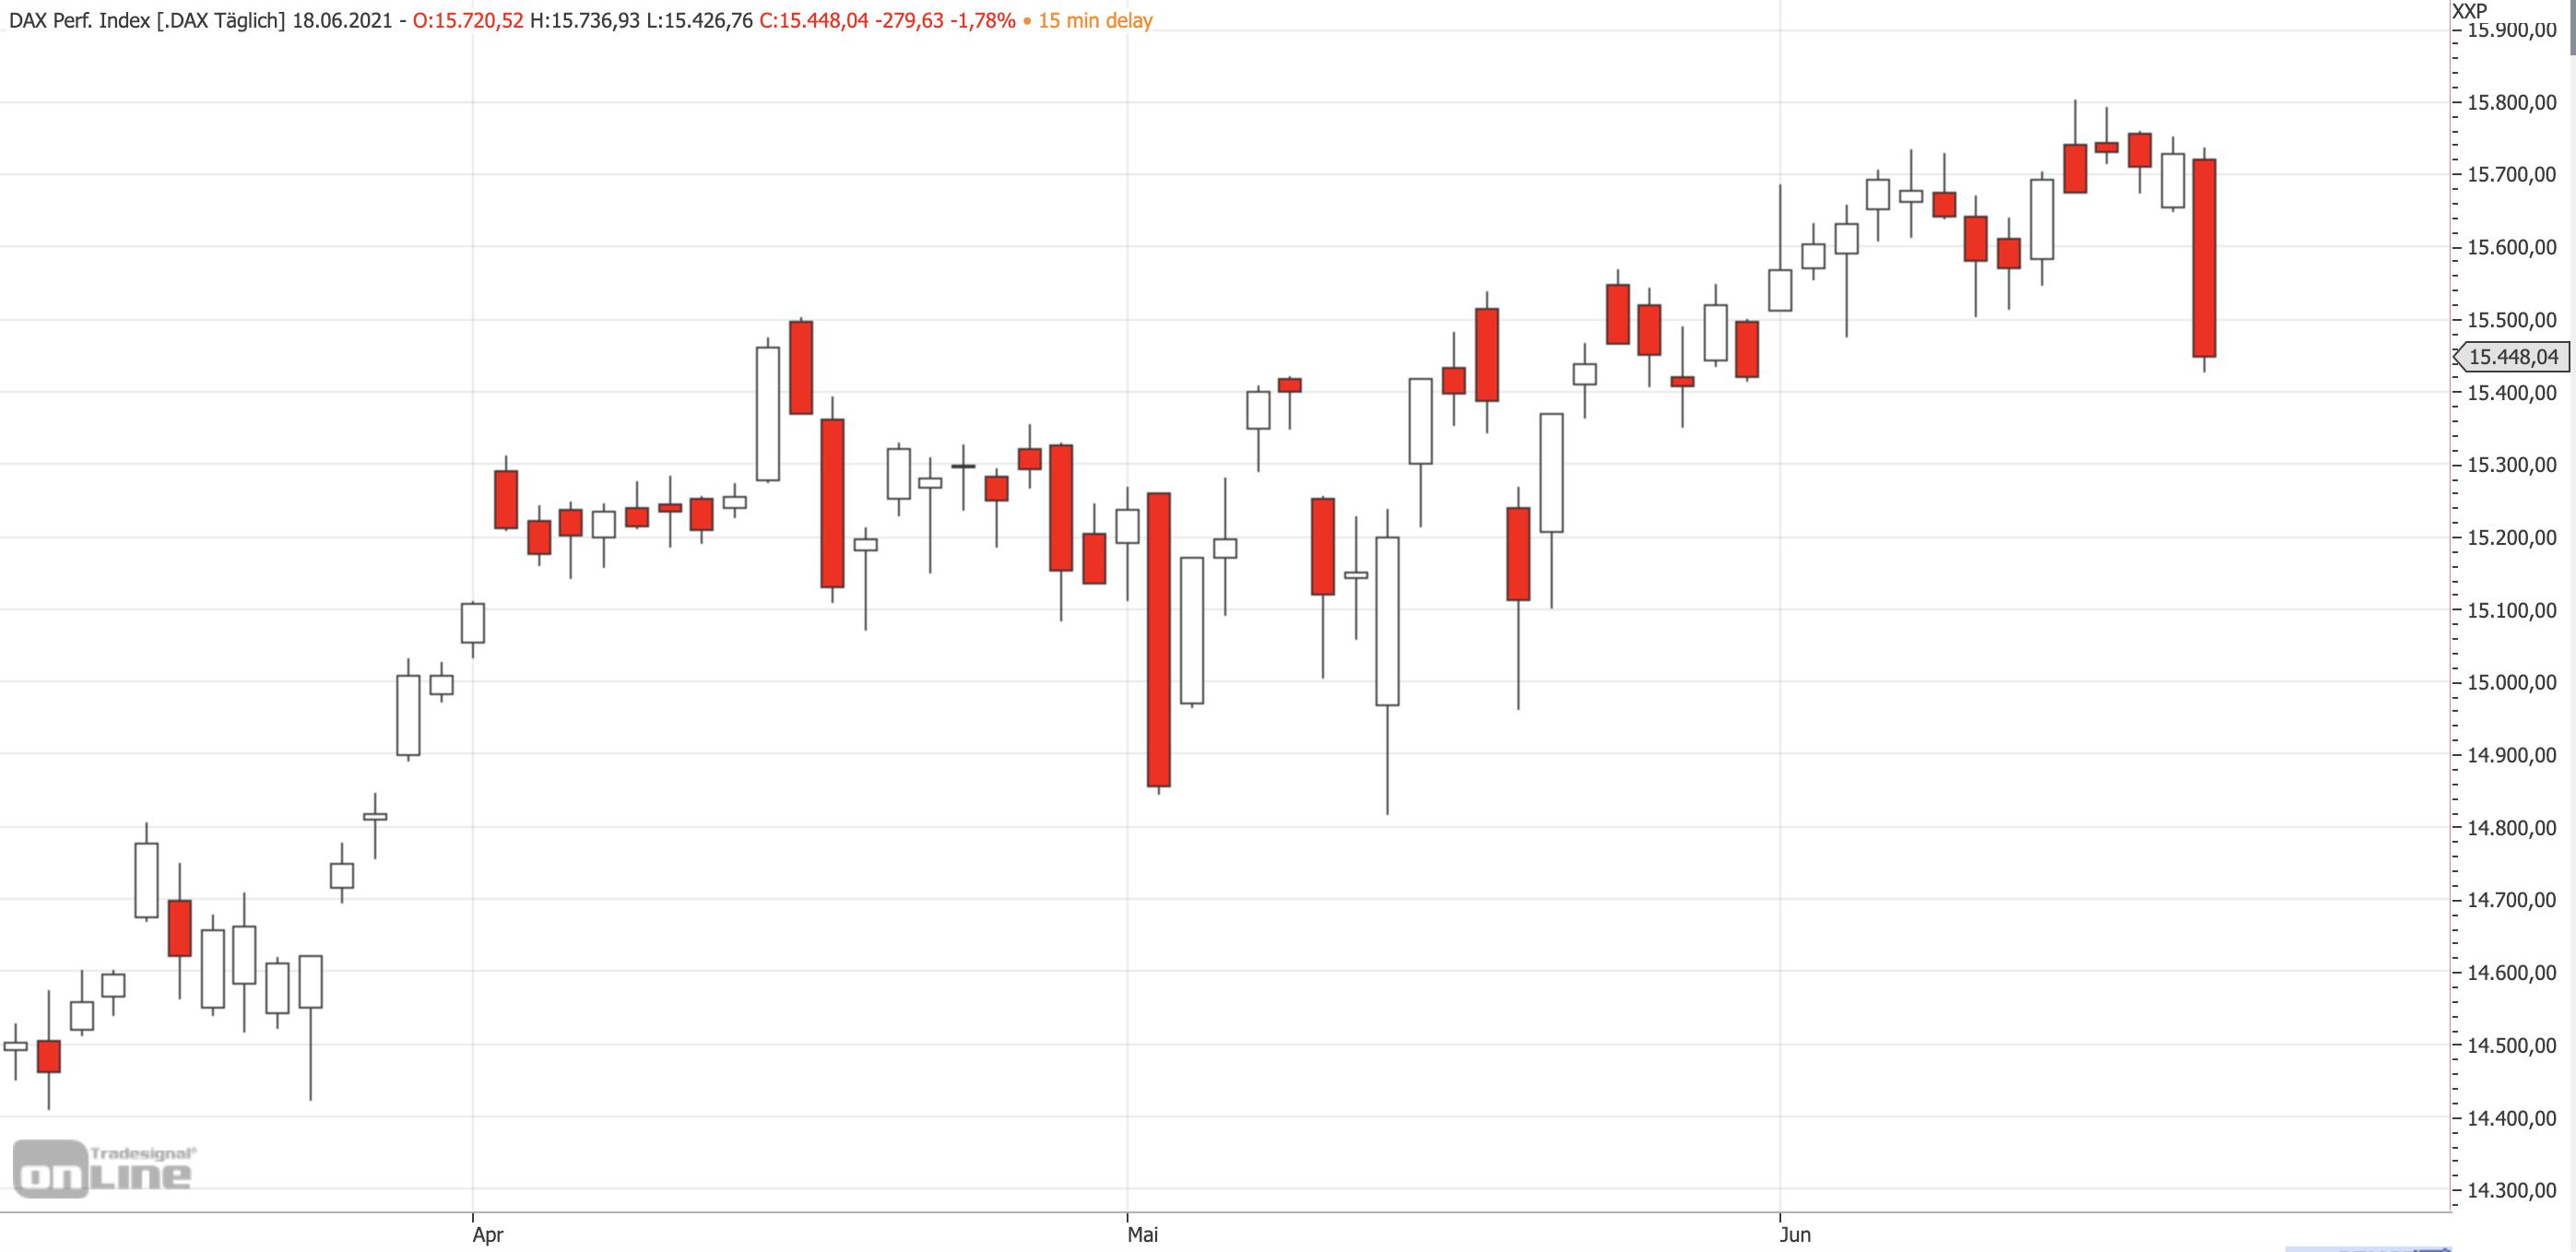 Mittelfristiger DAX-Chart am 17.06.2021